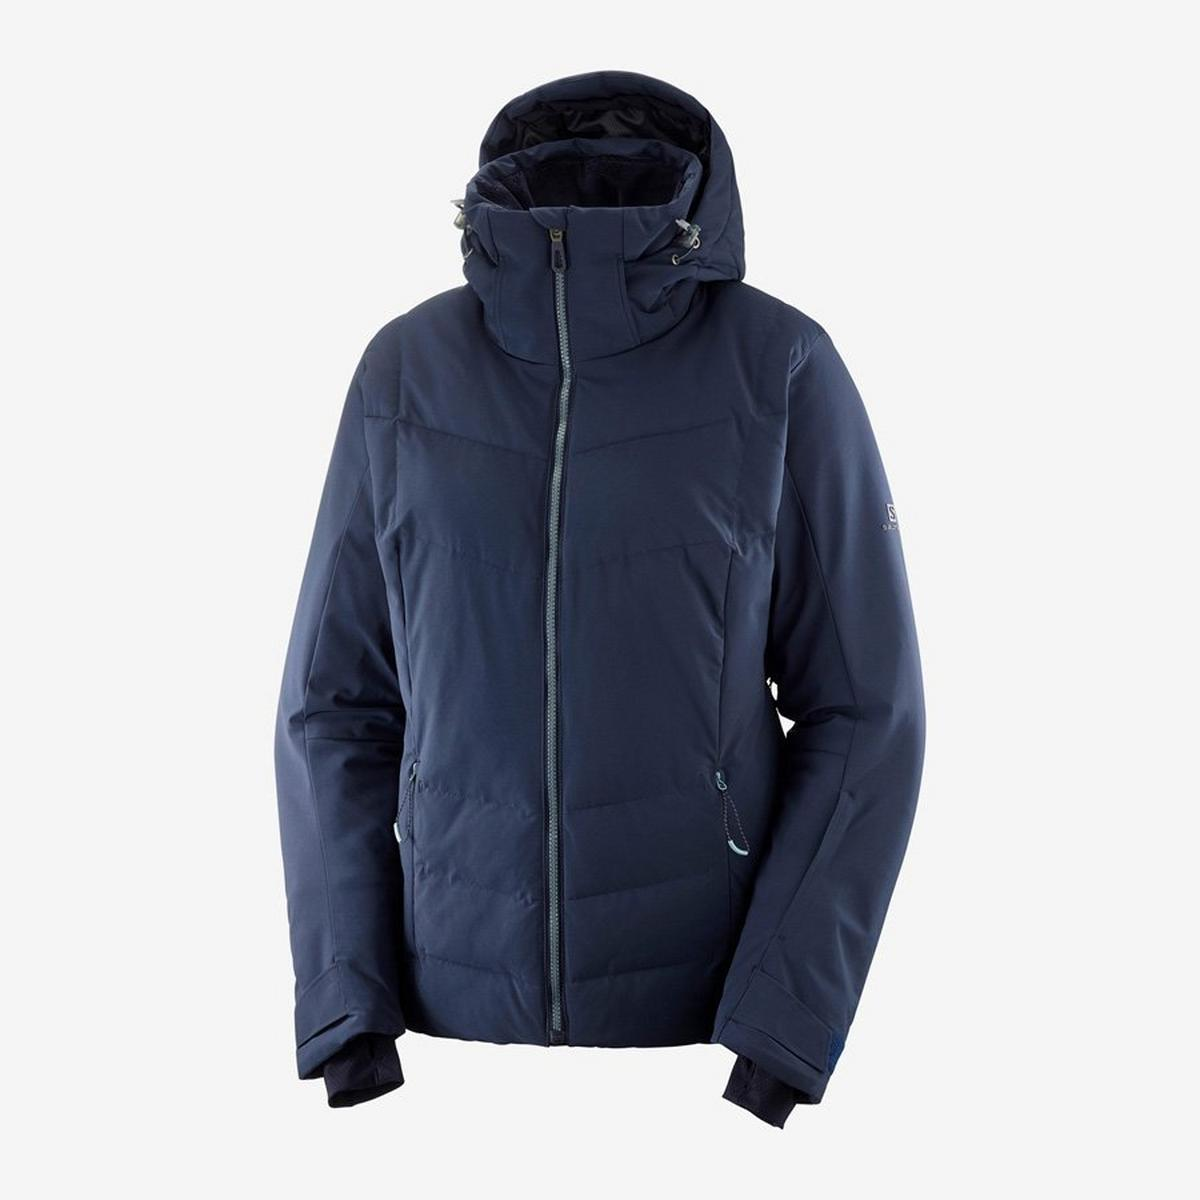 Salomon Icepuff Jacket